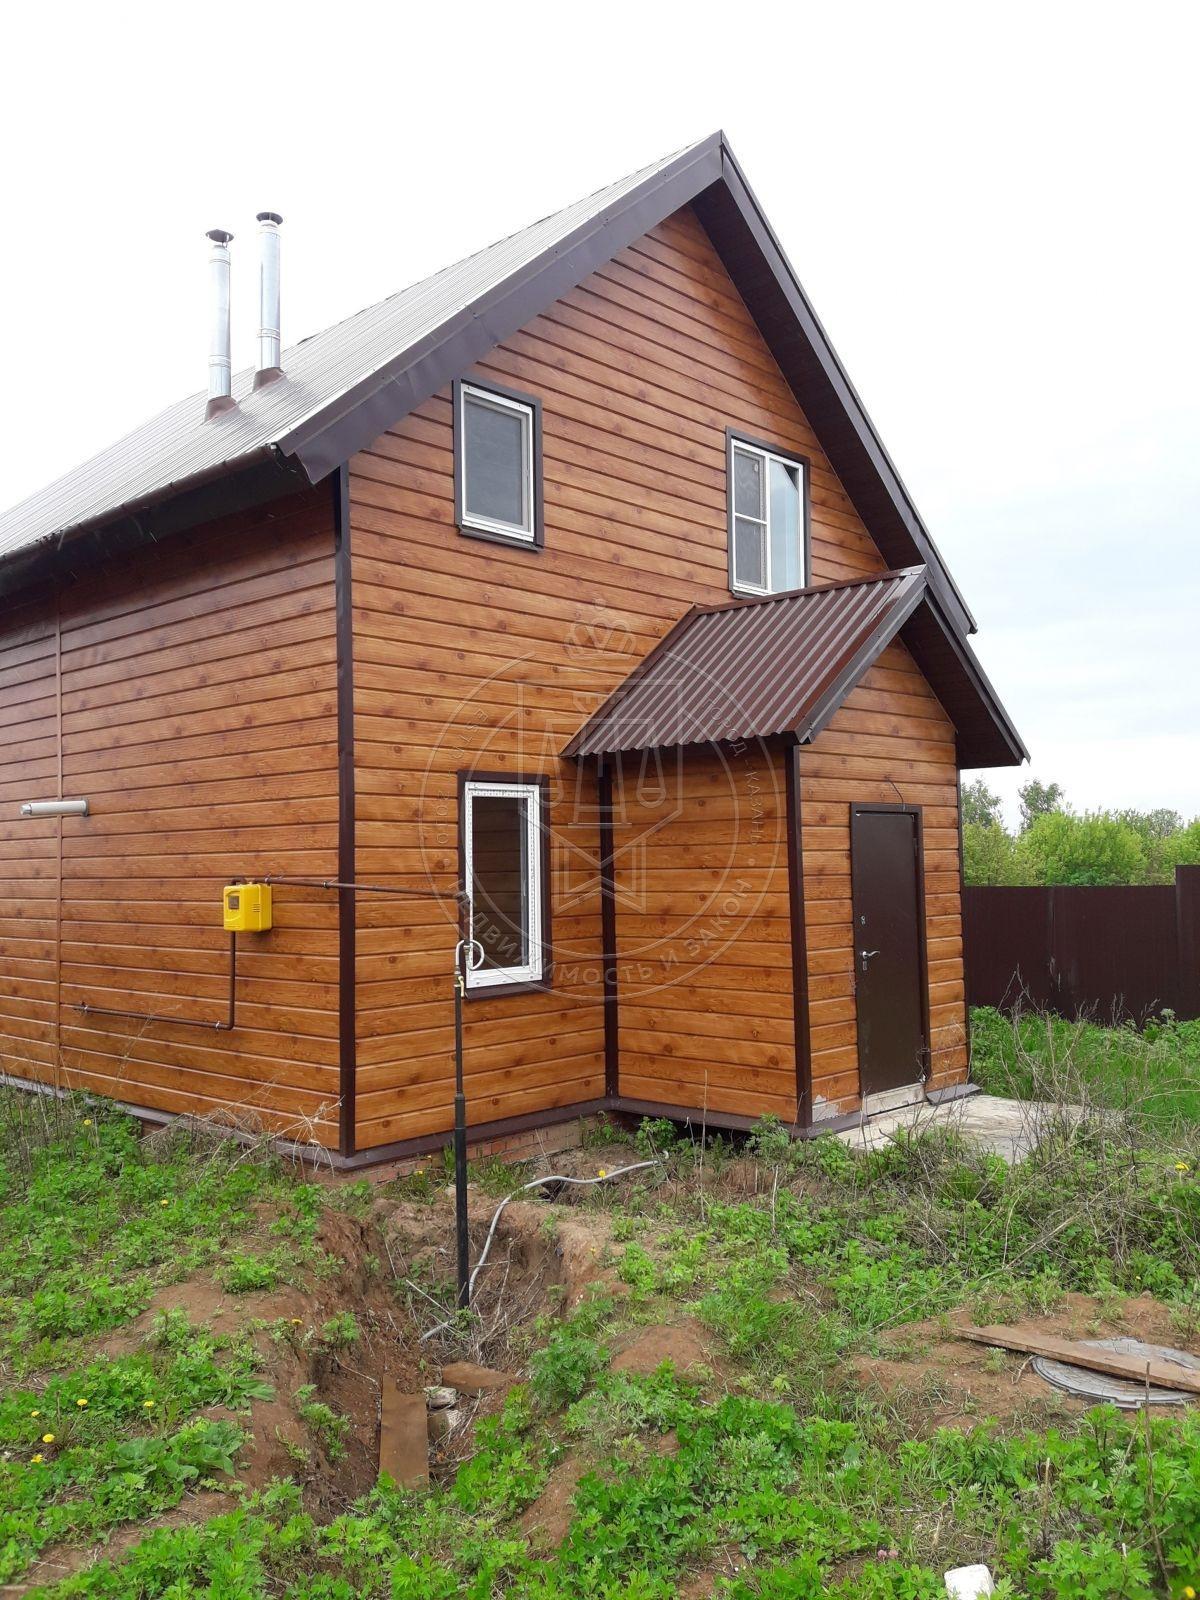 Продажа  дома п. Куюки, ул Центральная, 100.0 м² (миниатюра №4)